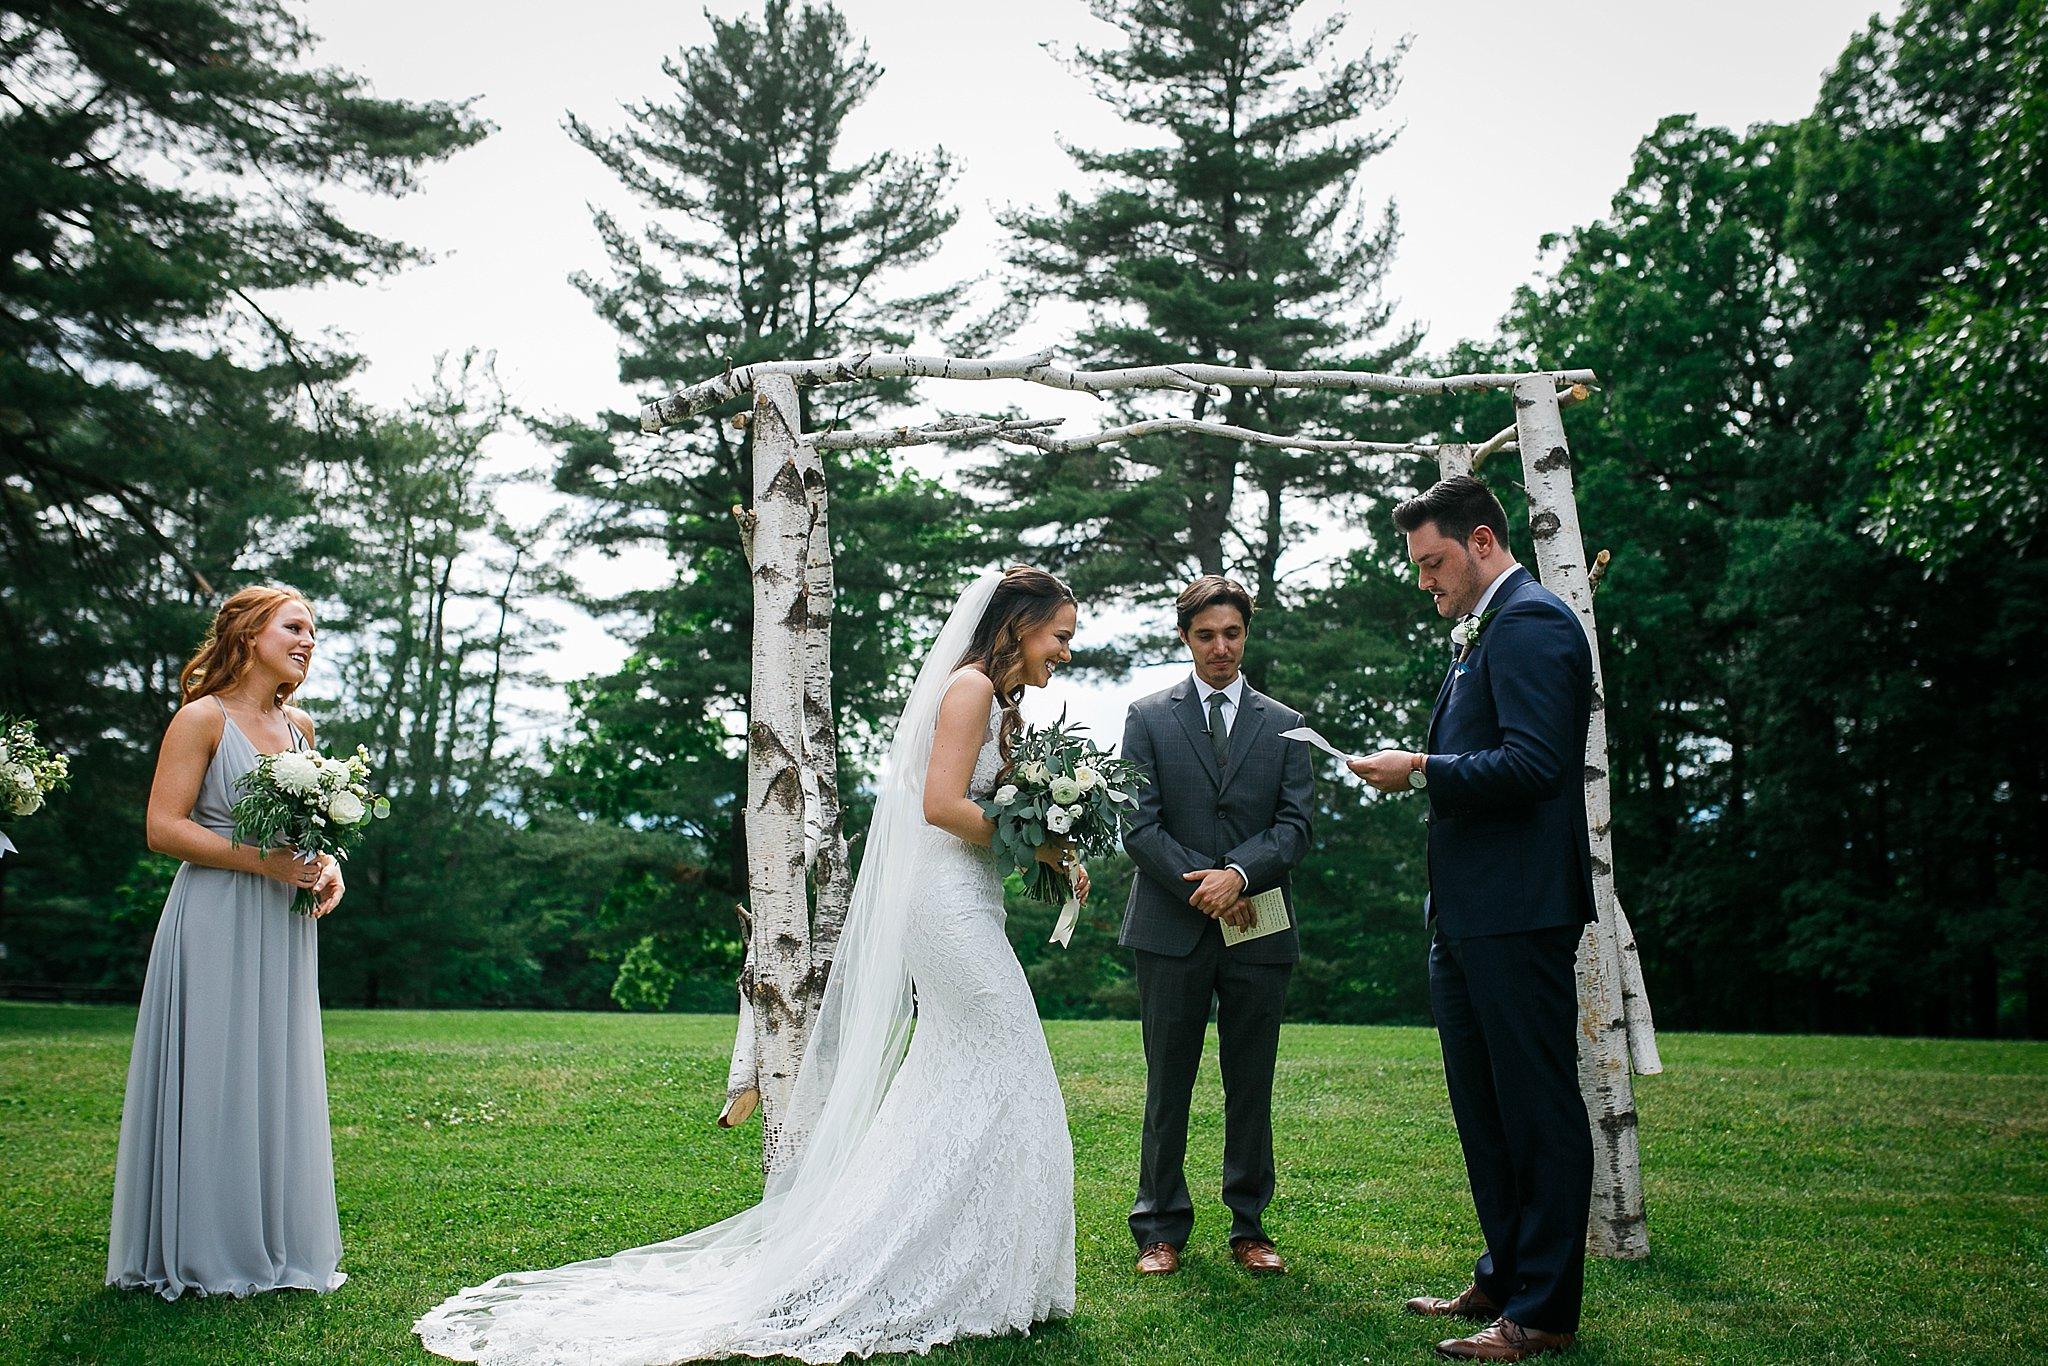 Hudson Valley Weddings at the Hill Hudson New York Wedding Photographer51.jpg